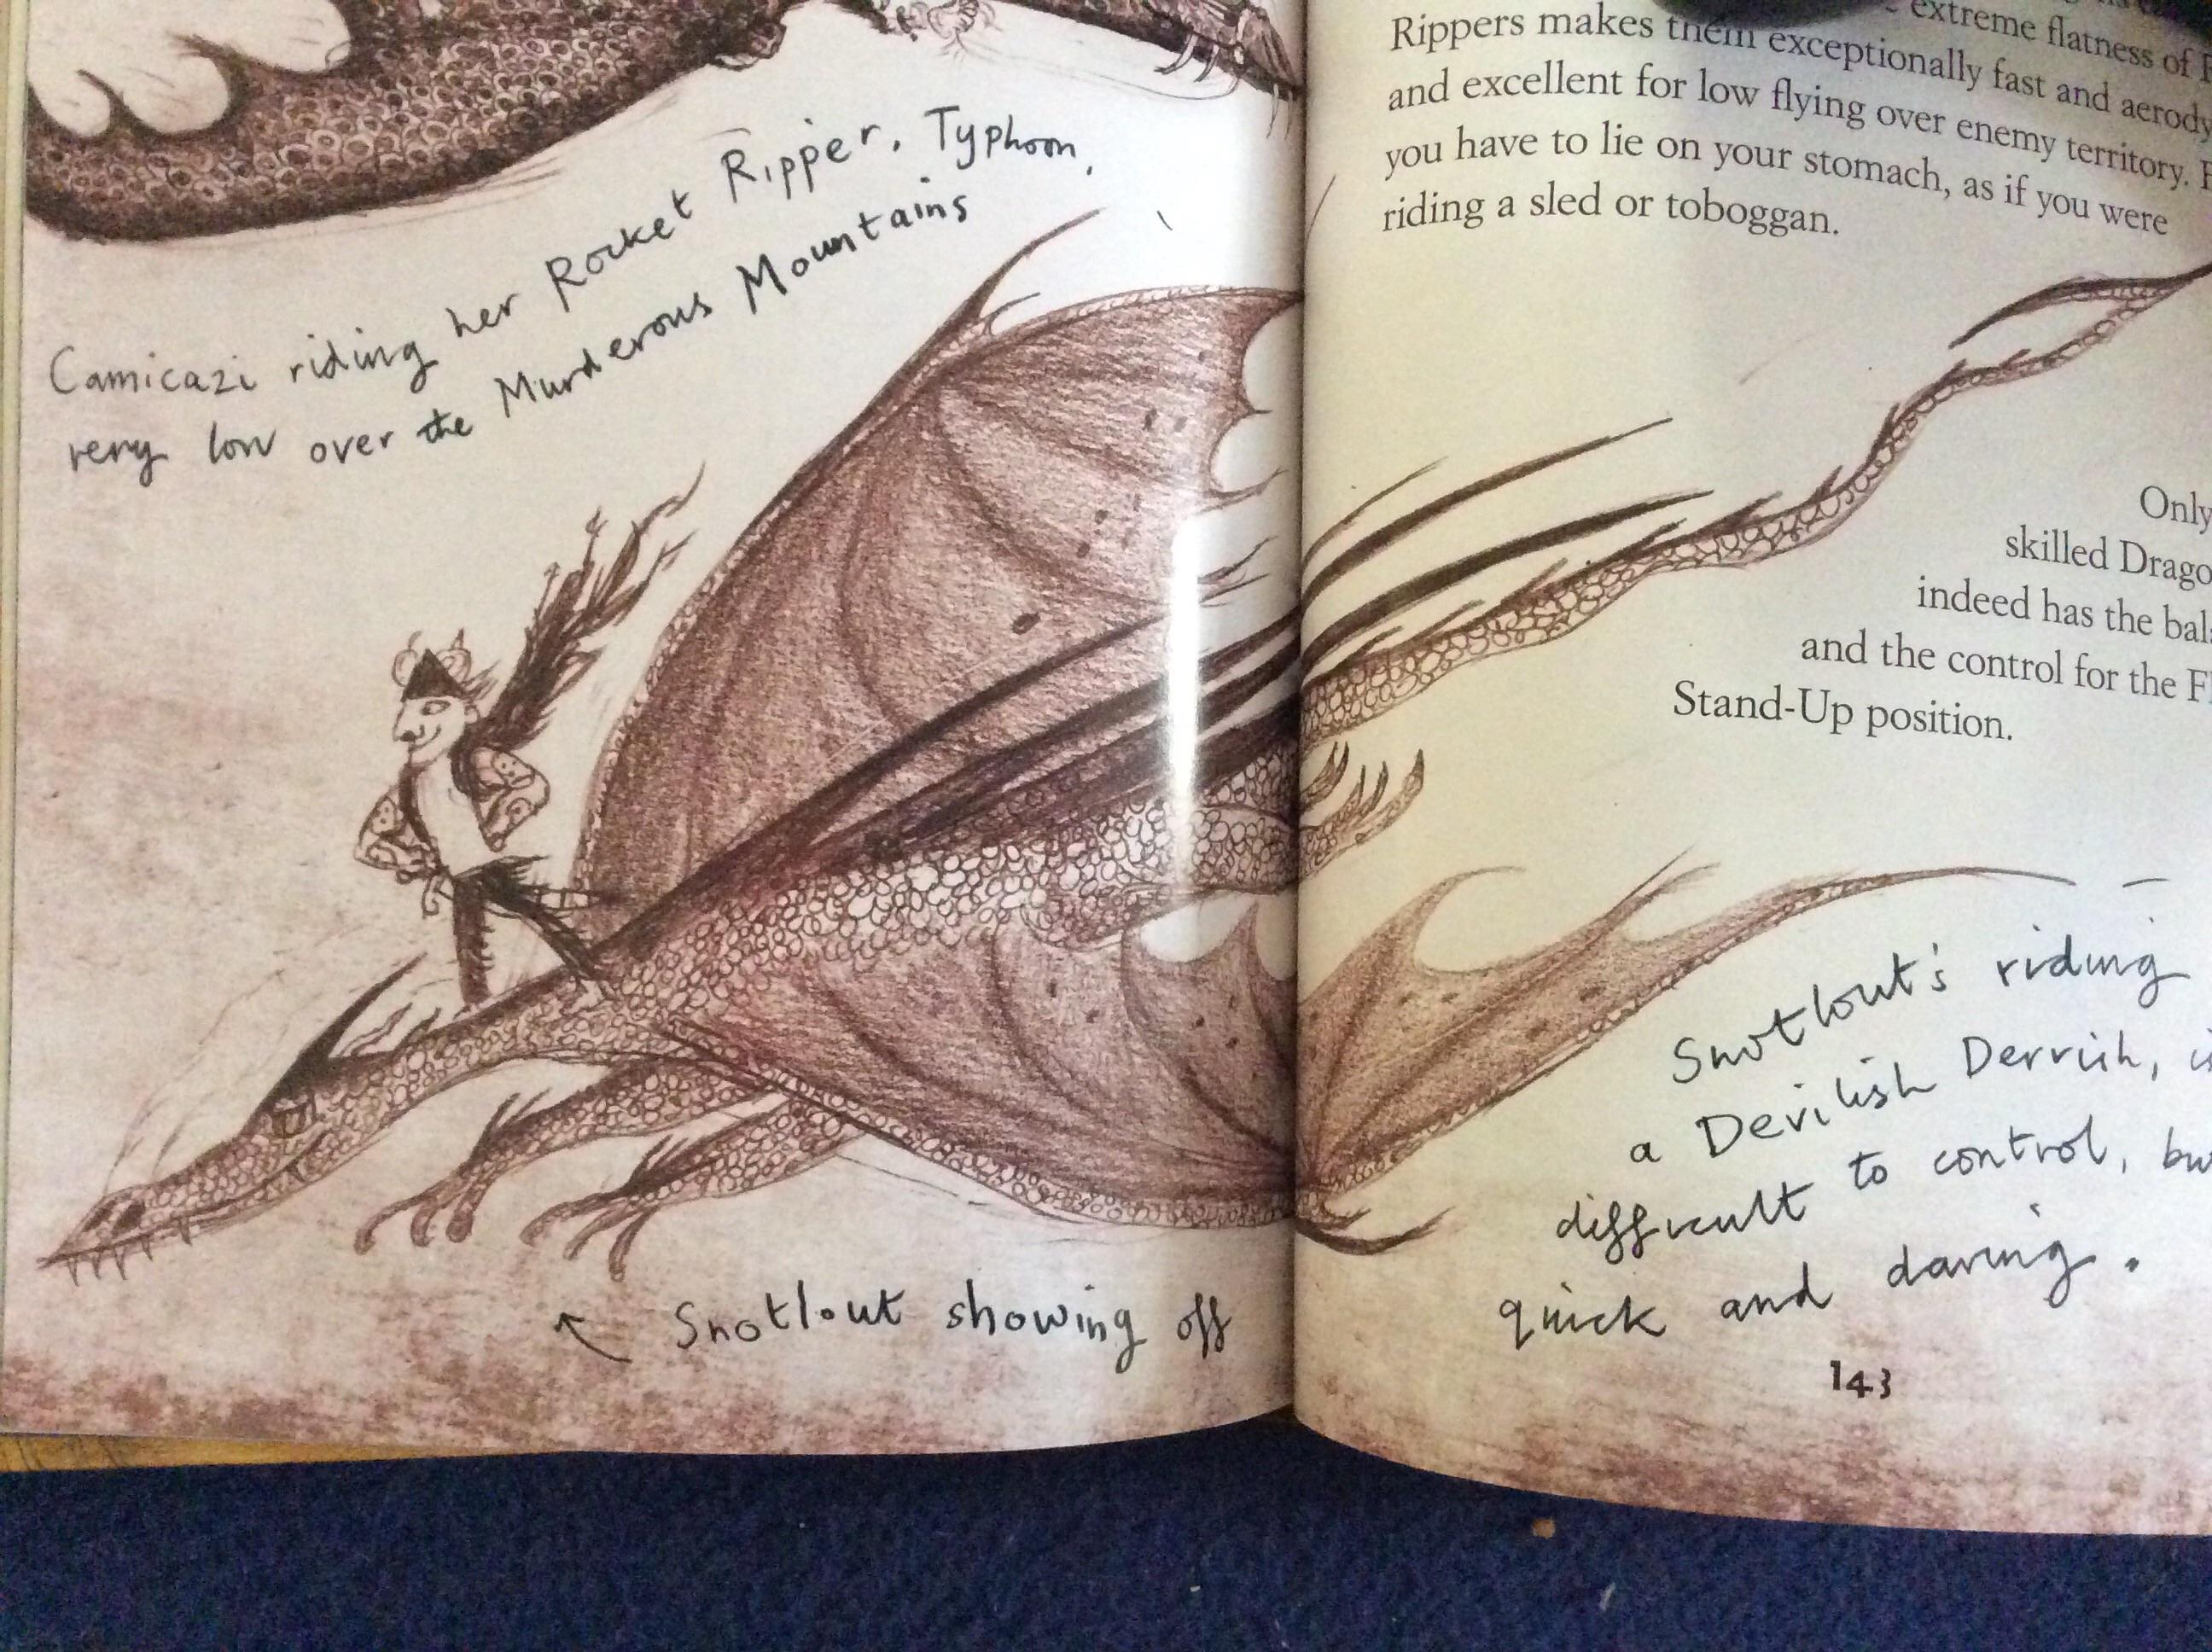 the new devilish dervish book vs game school of dragons how